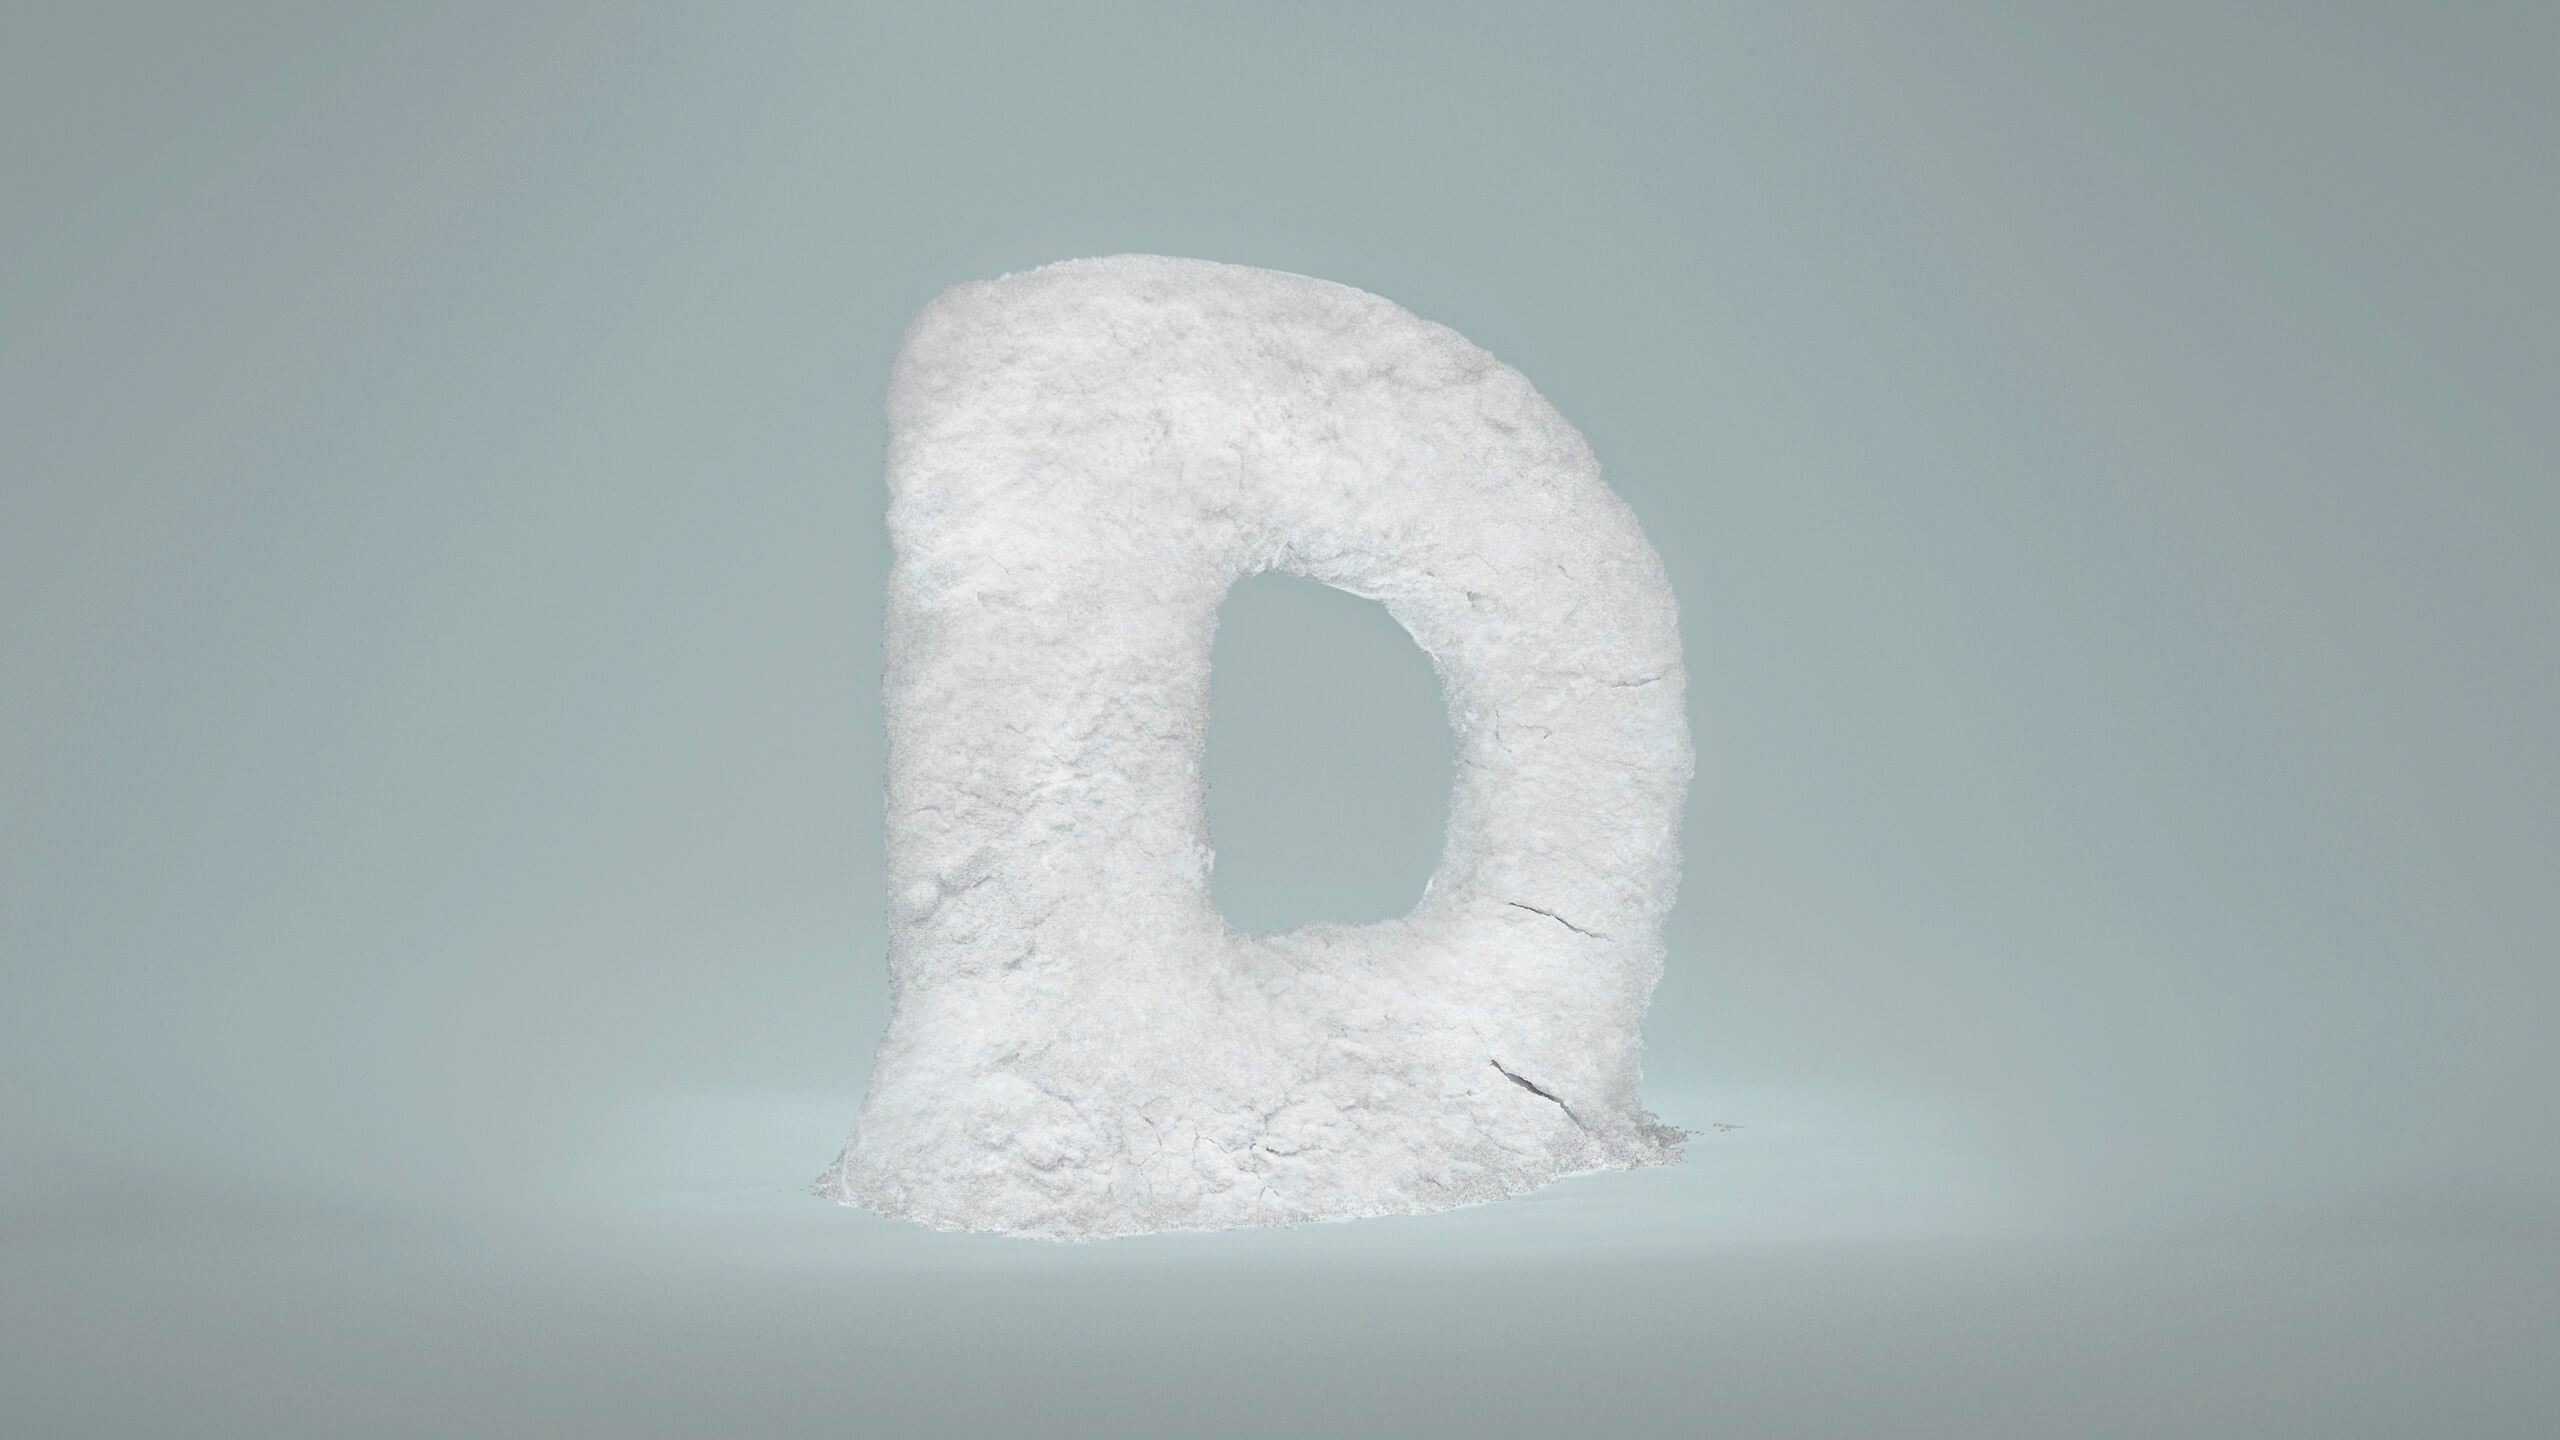 Buchstabe D symbolhaft umgesetzt